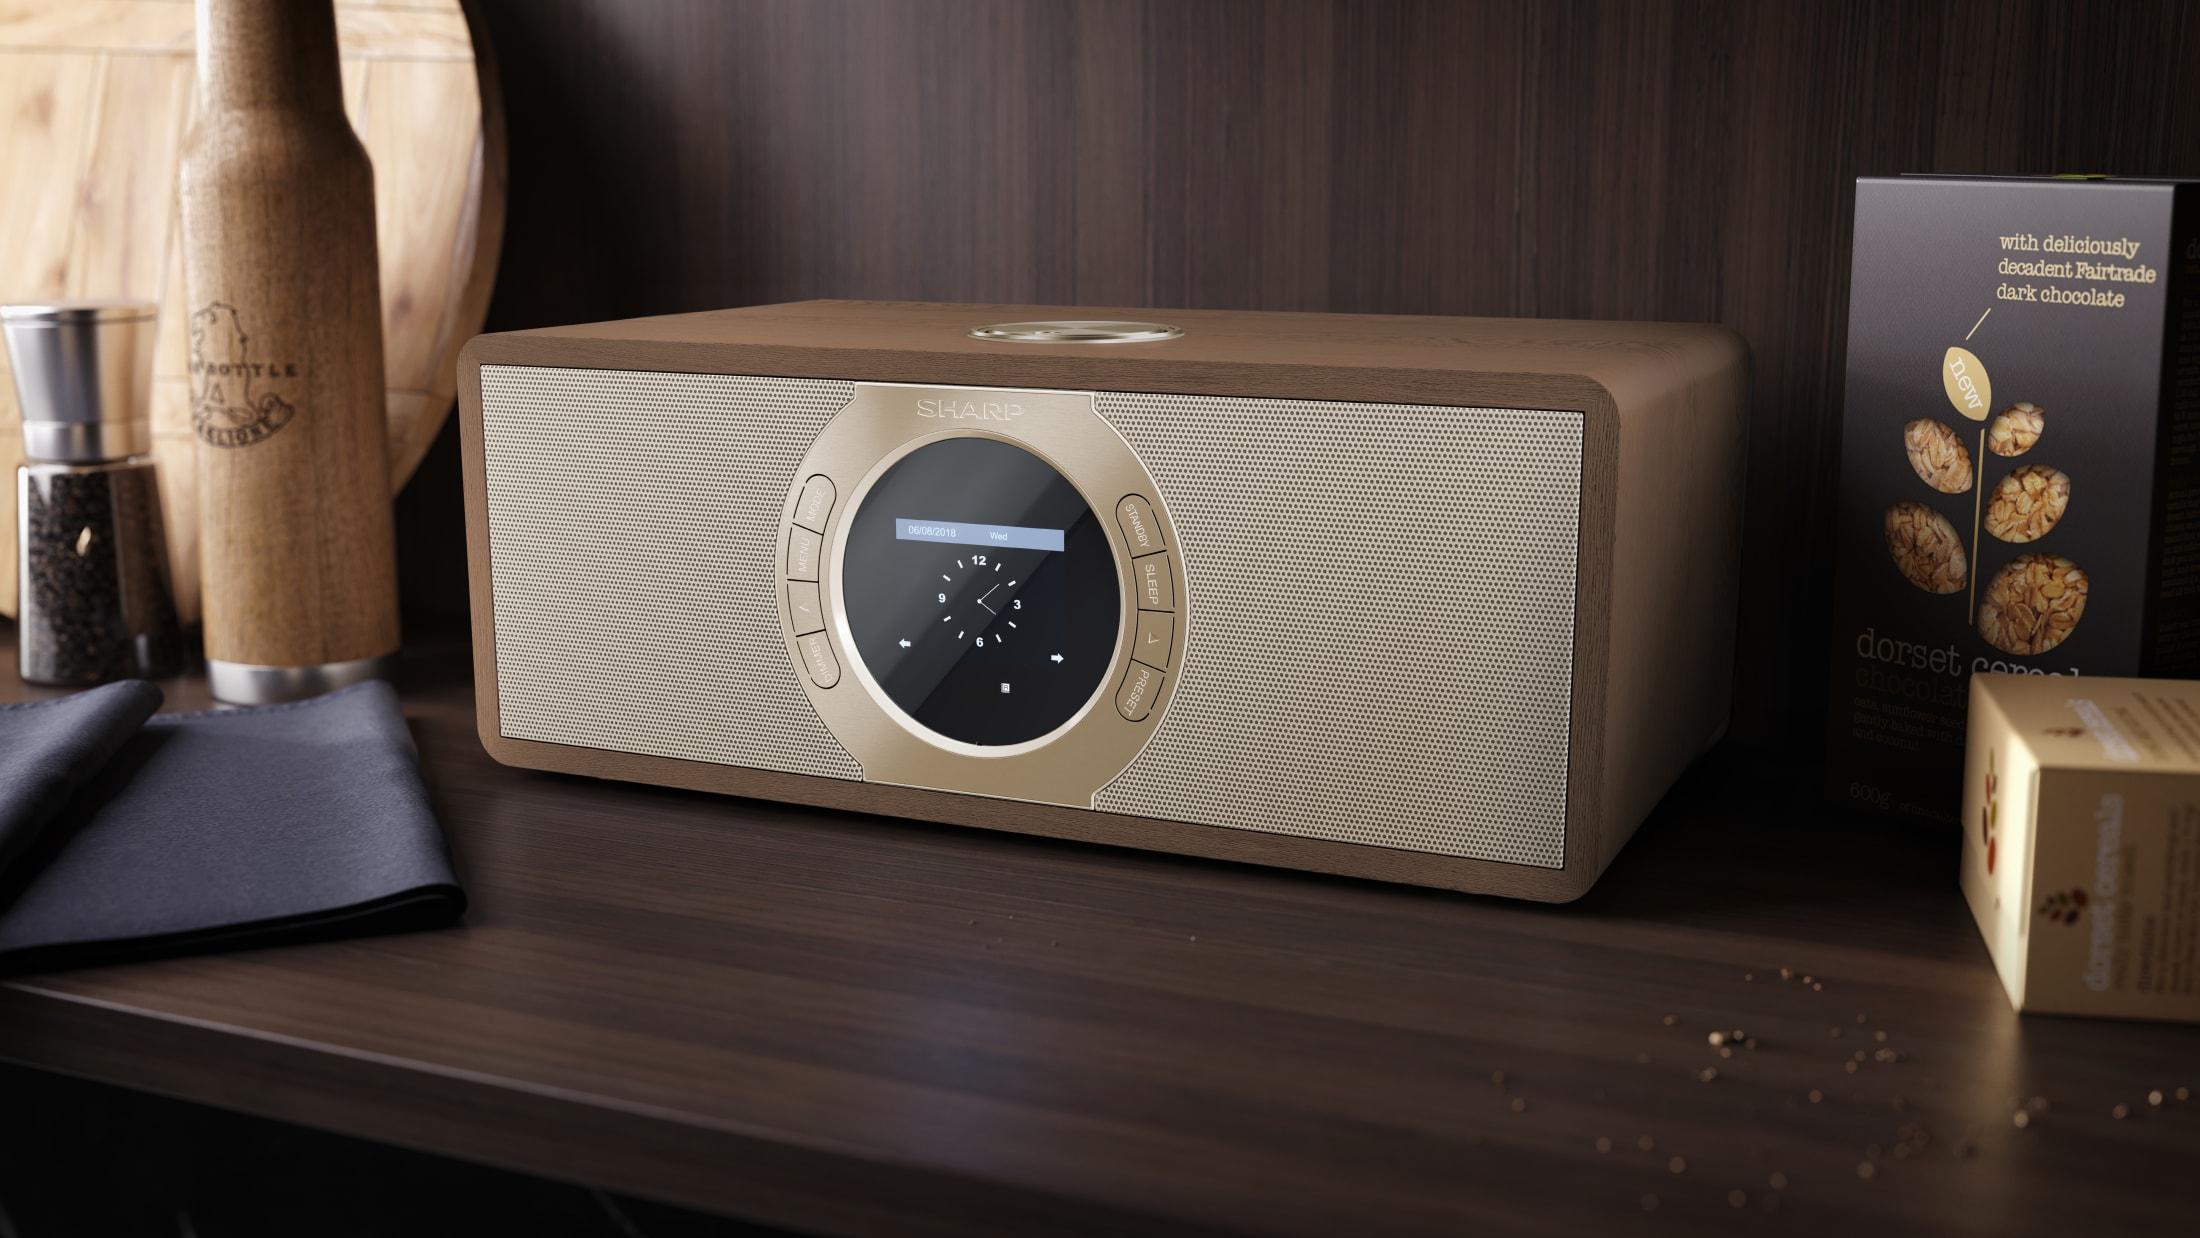 Stereo Internet-/Digitalradio DAB/DAB+/FM with RDS, 30 W, Bluetooth and 60 station memory.